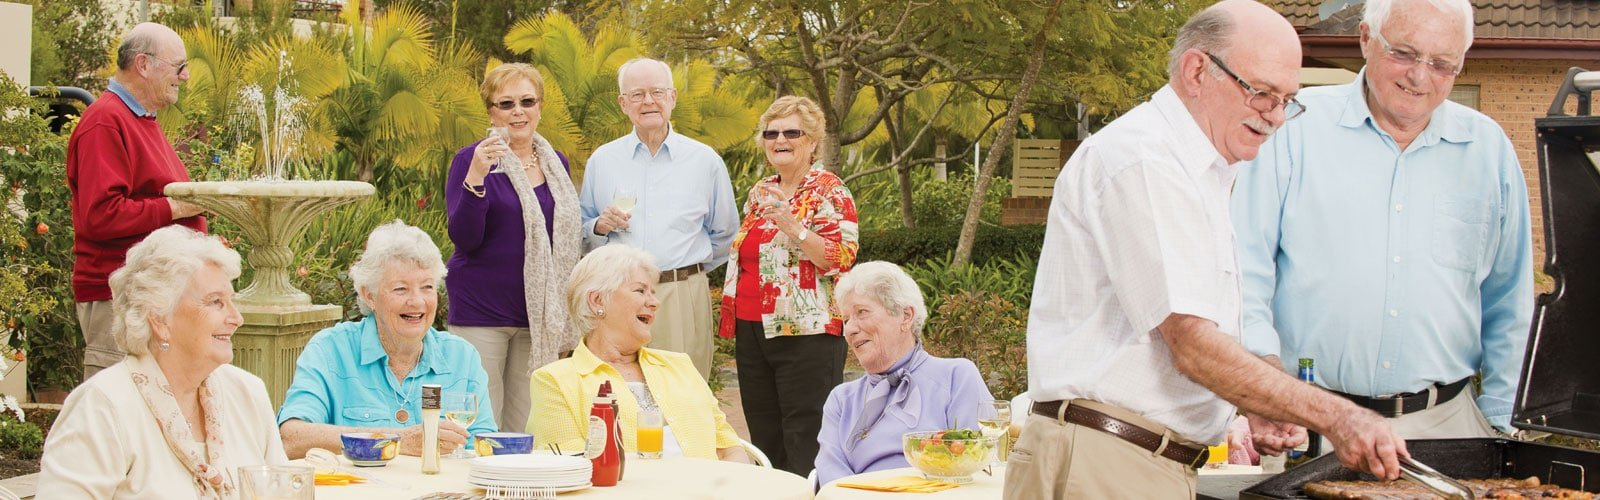 Central Coast Retirement